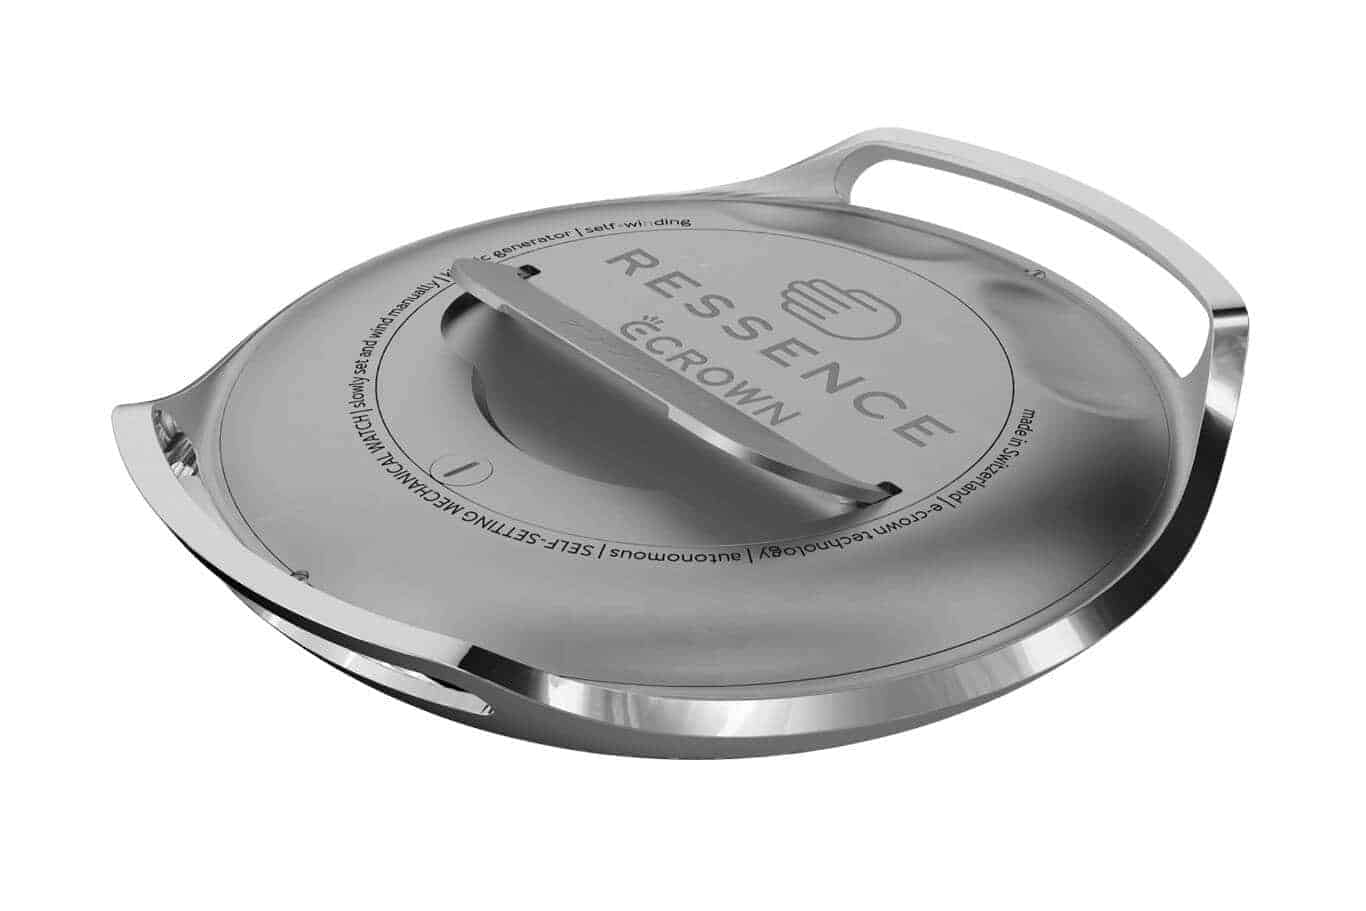 ressence Type 2 e Crown Concept smartwatch concept image 07